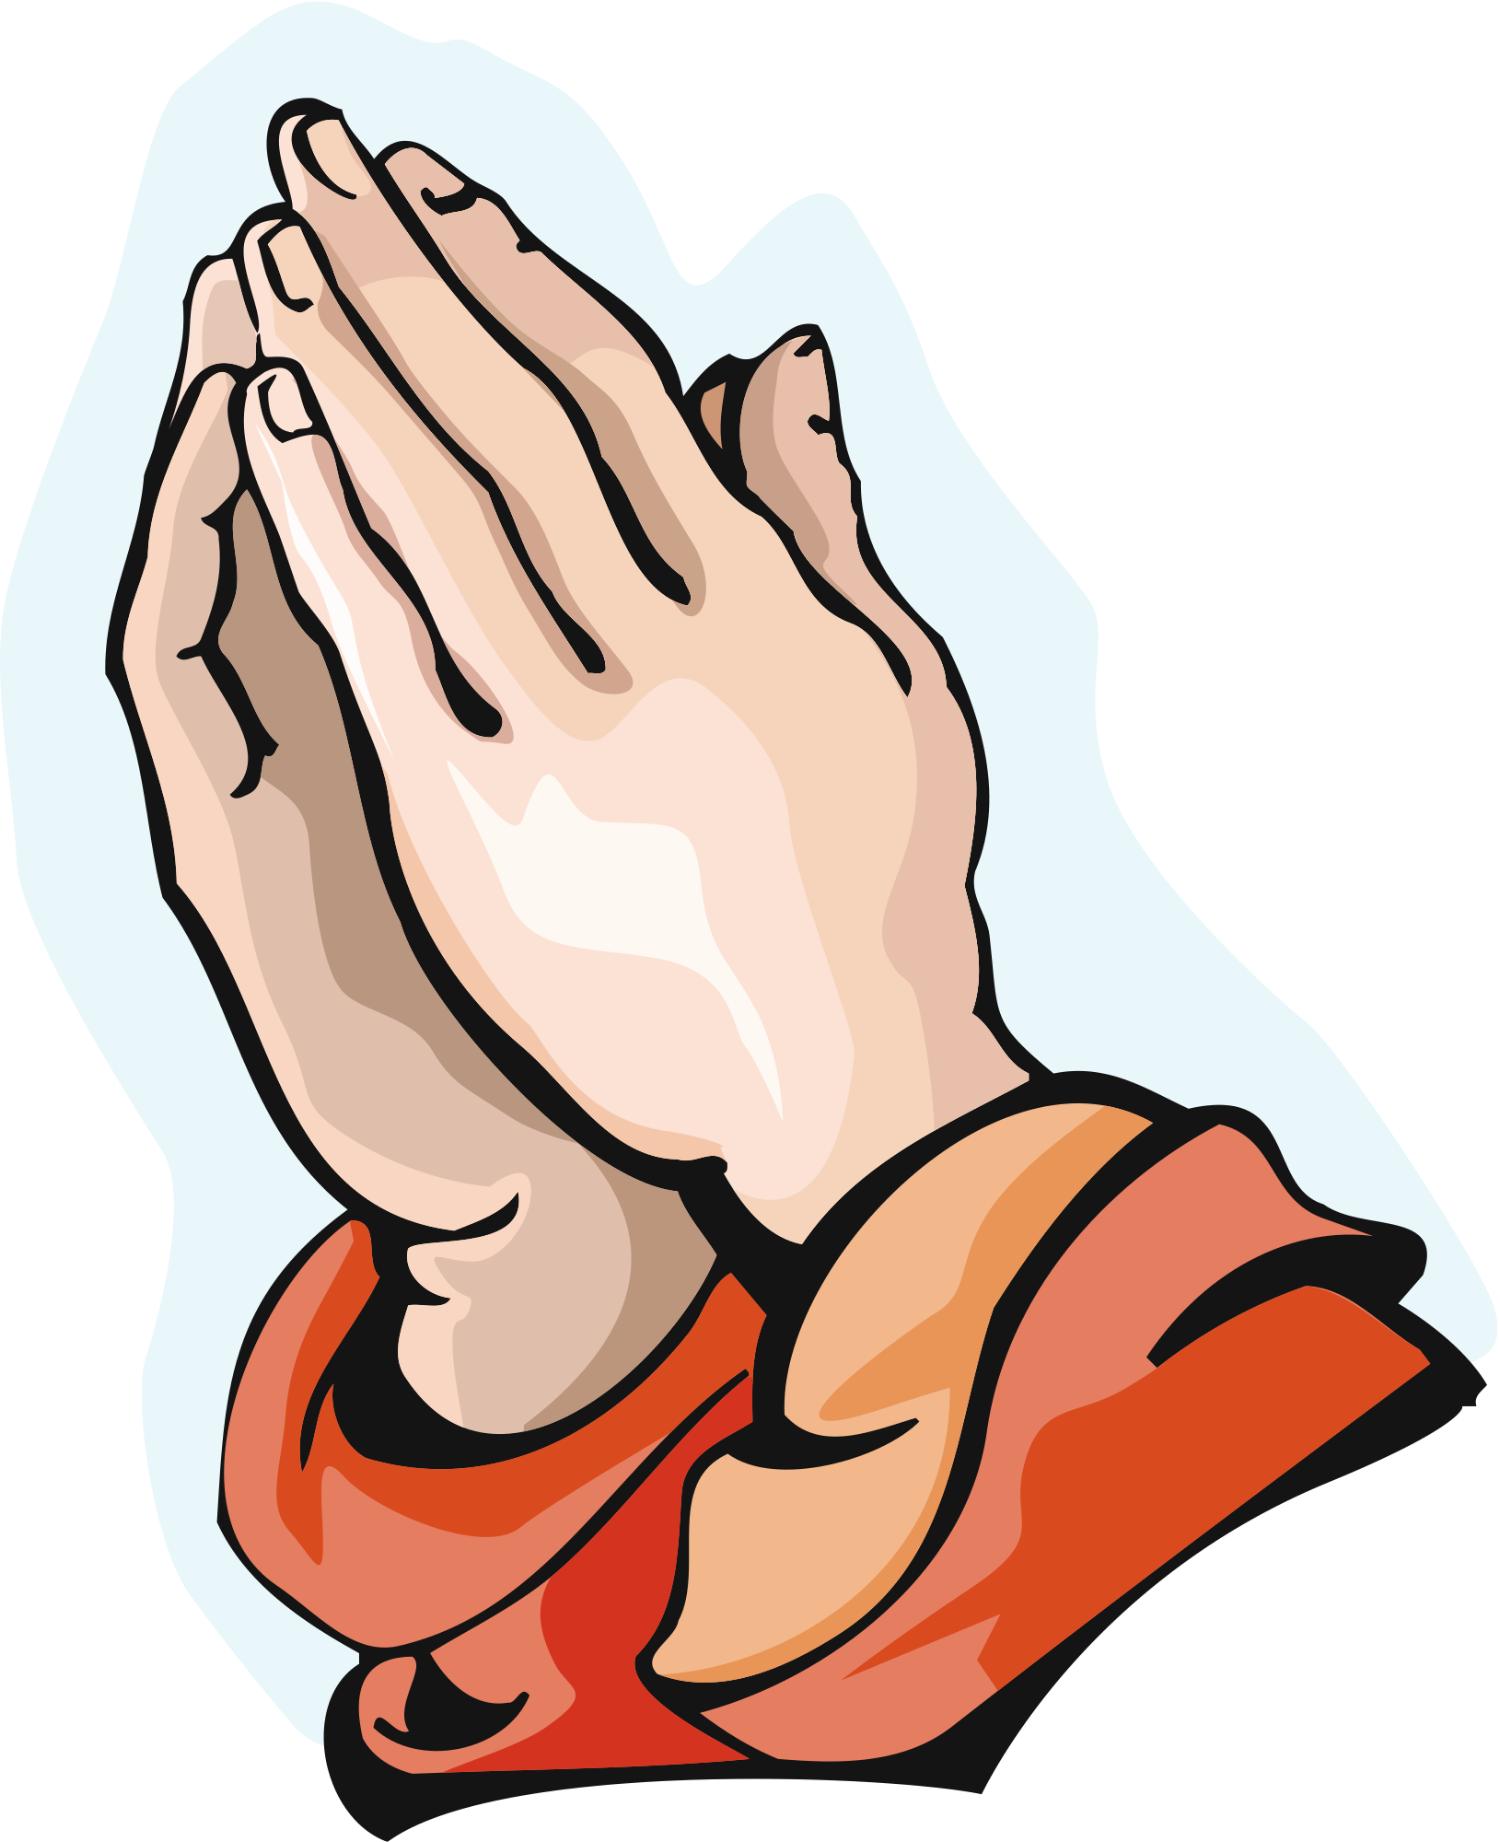 Prayer Hands Clipart | Free download best Prayer Hands